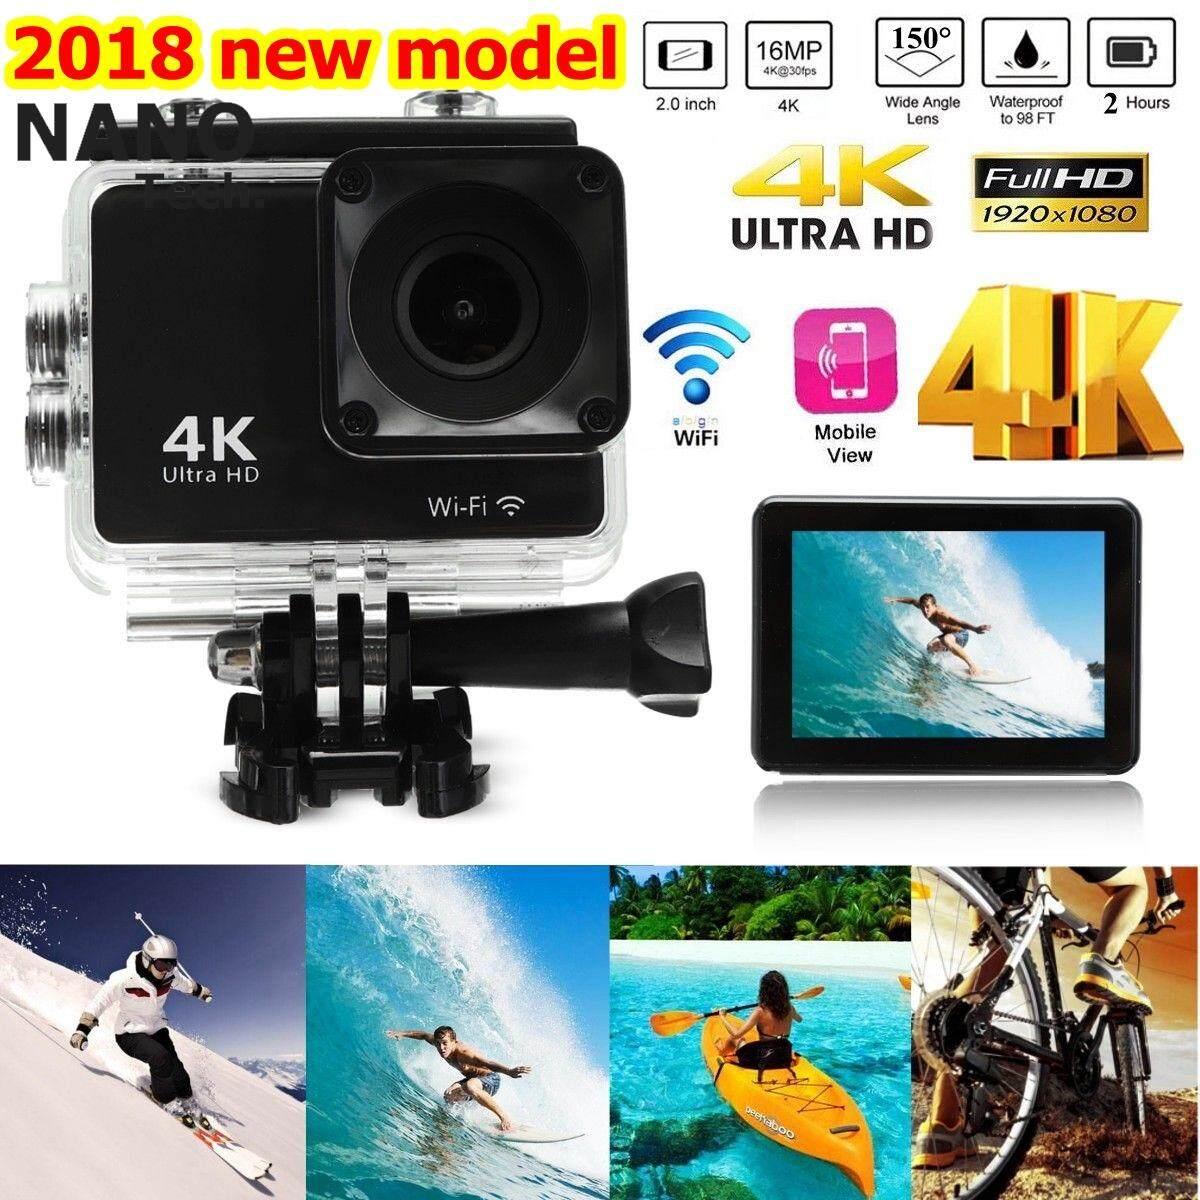 Sport Action Cam Camera Recorder กล้องกันน้ำ 4k H9k กล้องวีดีโอ Action Camera แท้ % - 4k H9k.